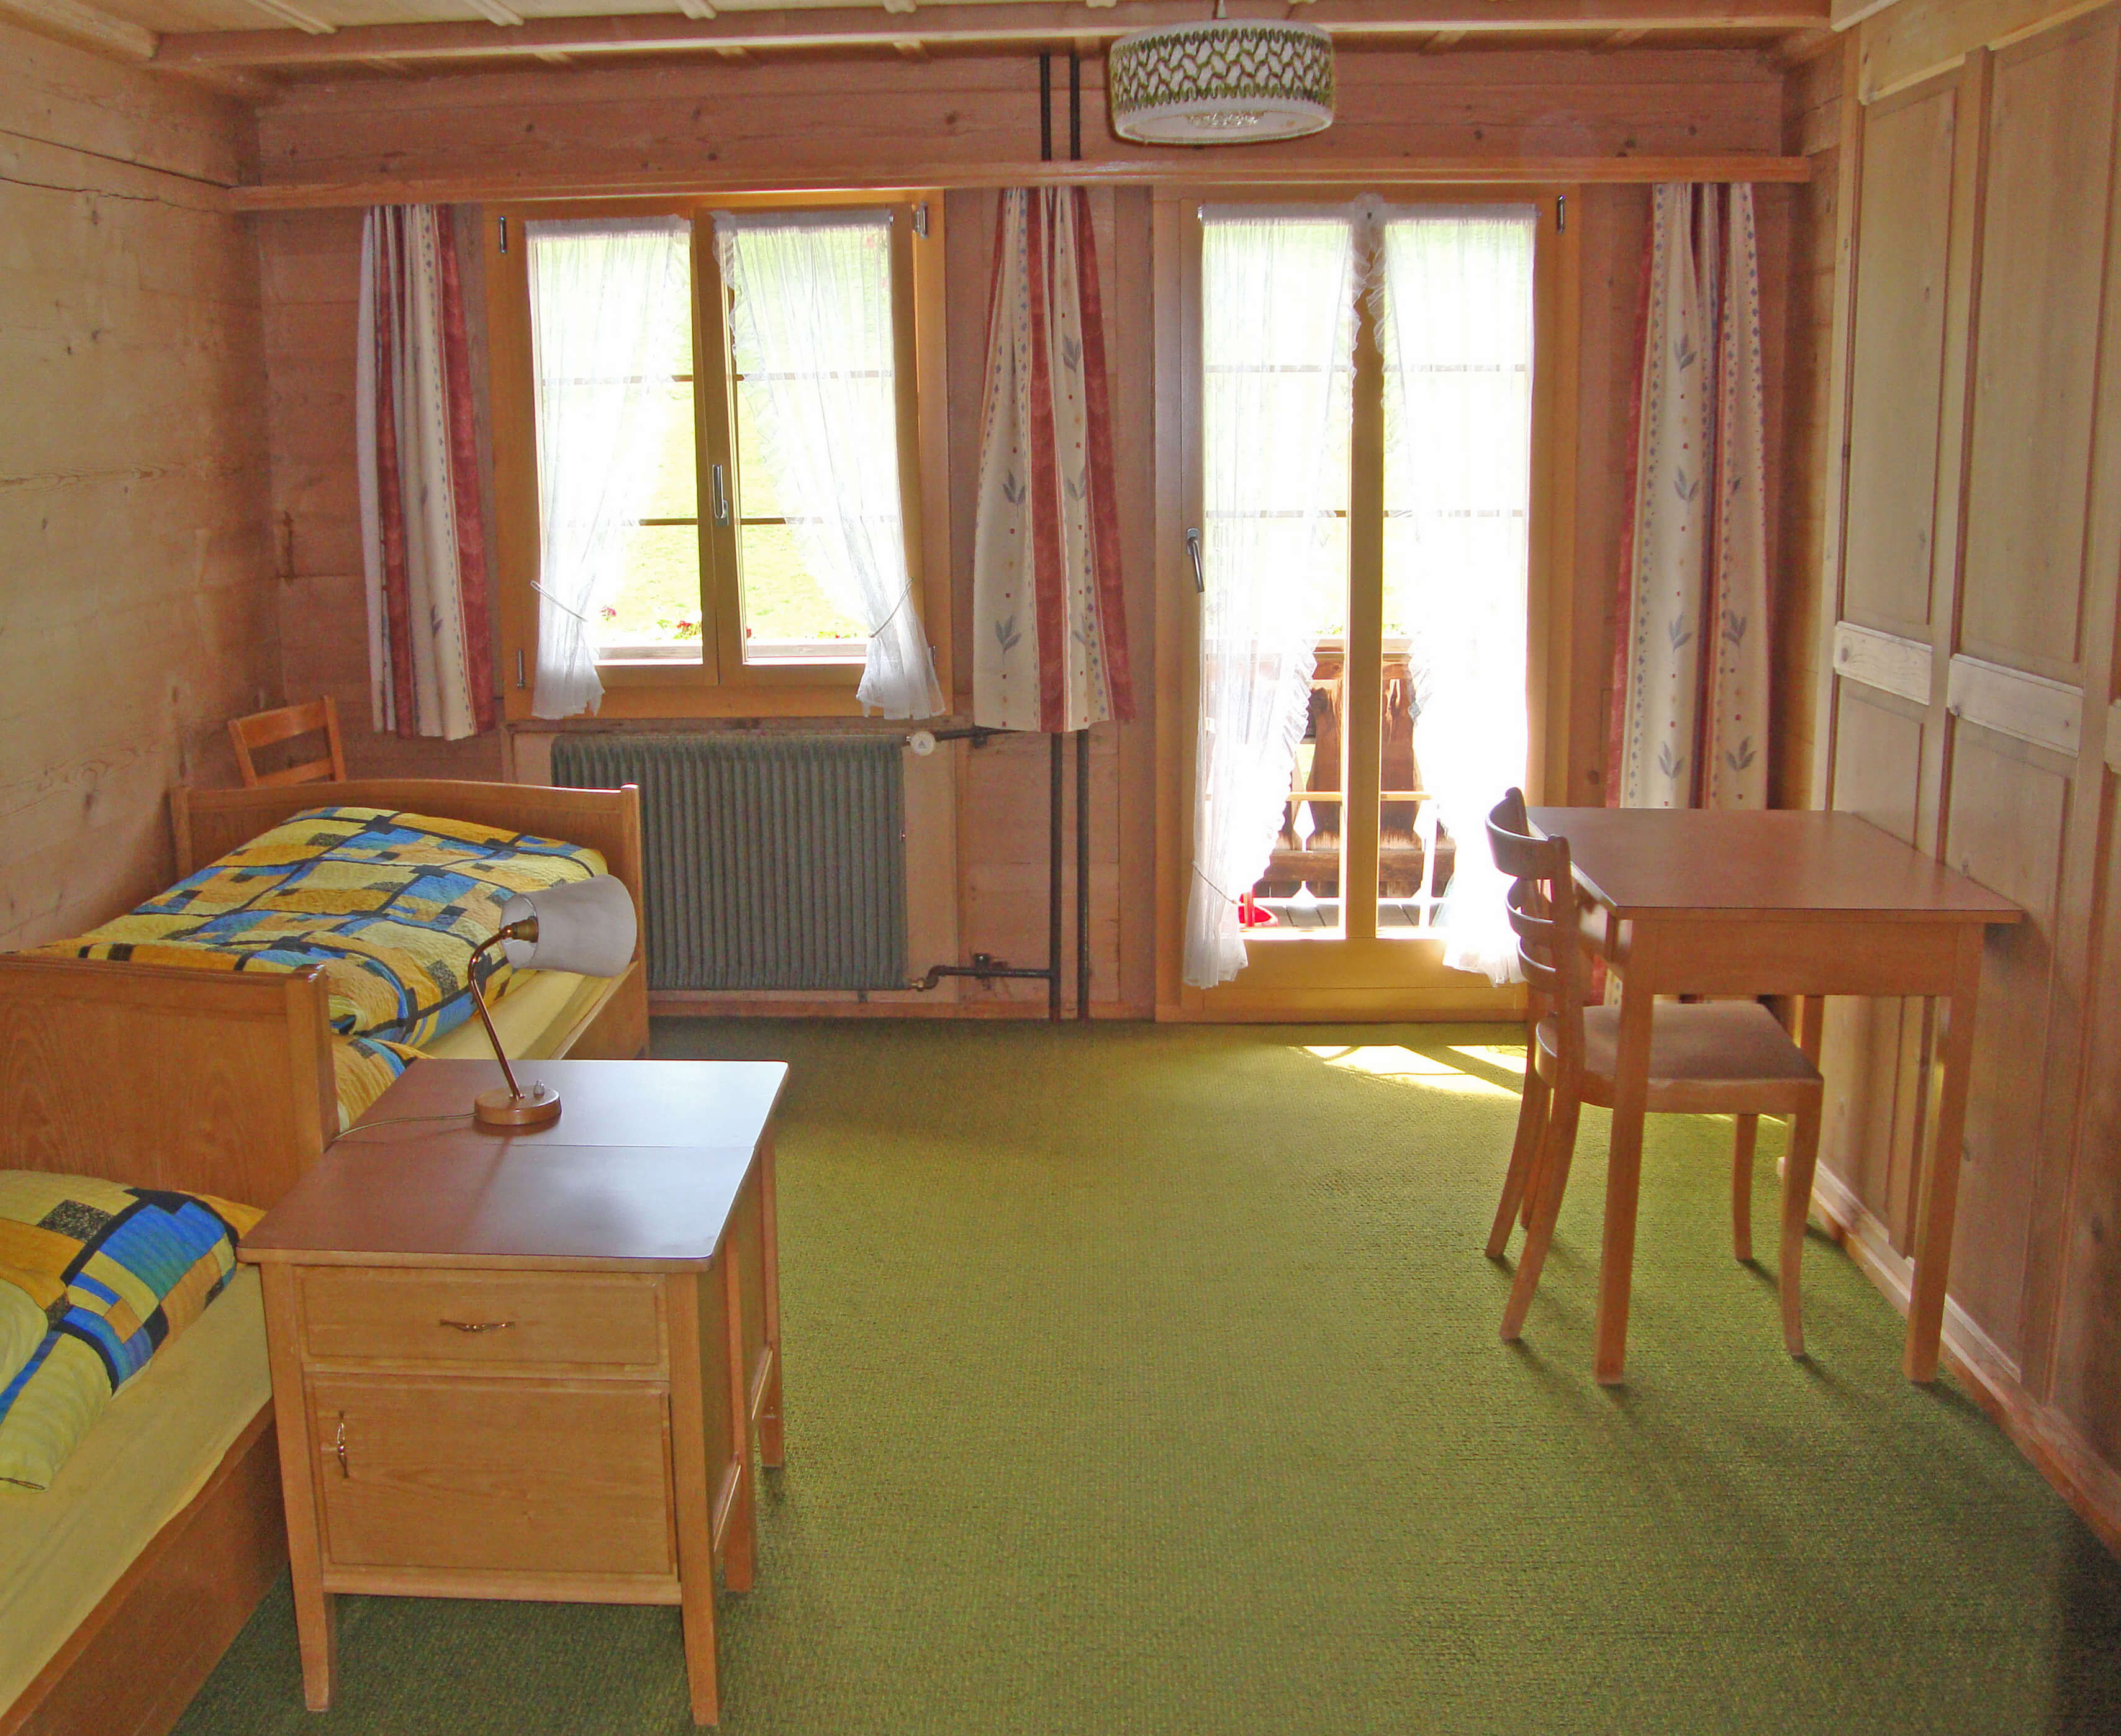 Zimmer Betten Tisch Balkon Haus Wyss